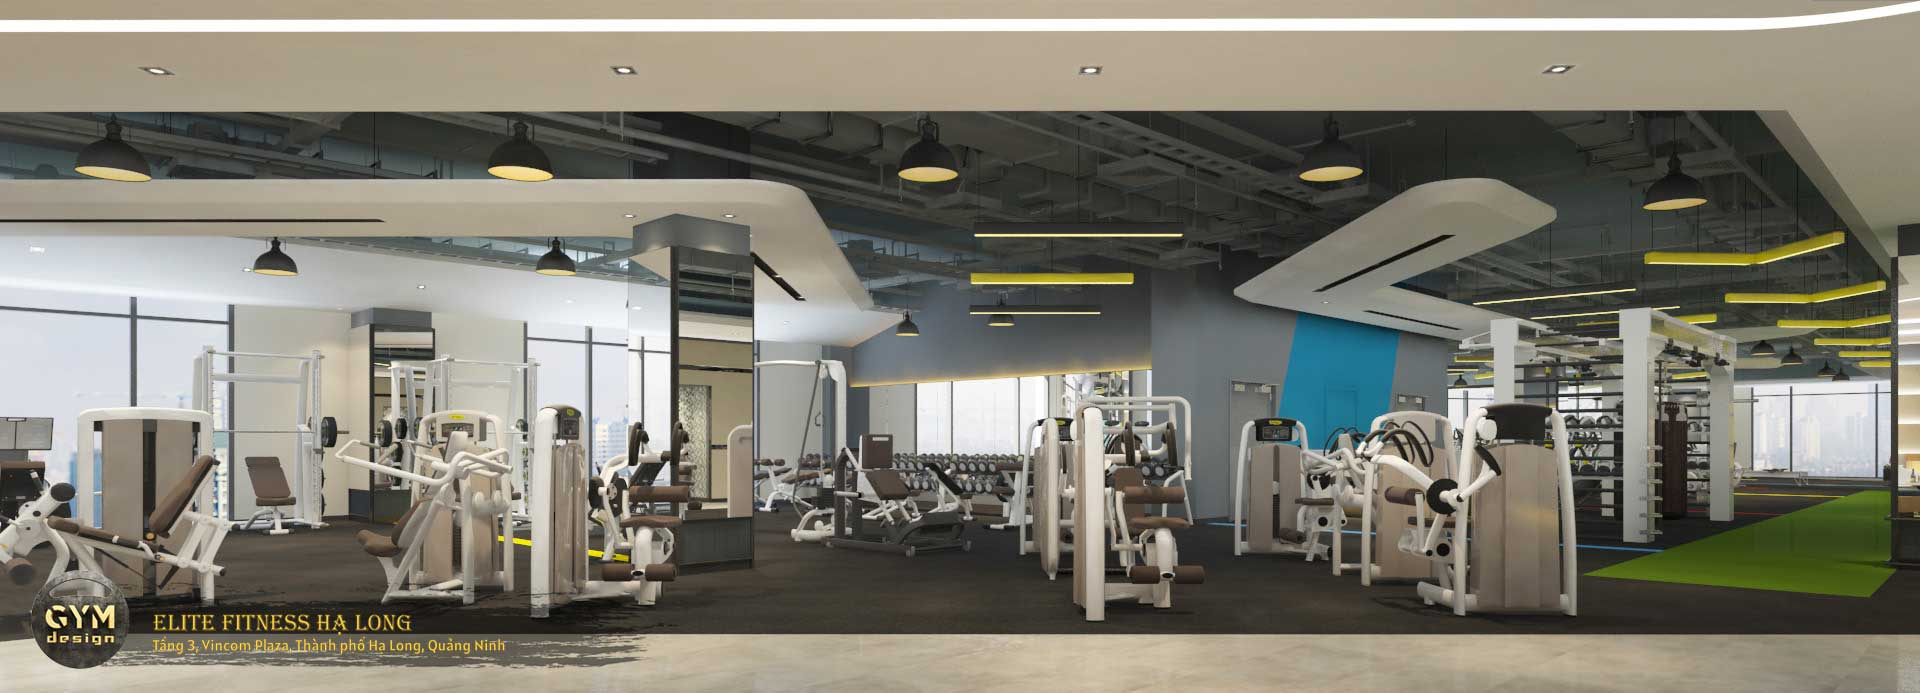 thiet-ke-phong-gym-elite-fitness-ha-long-18